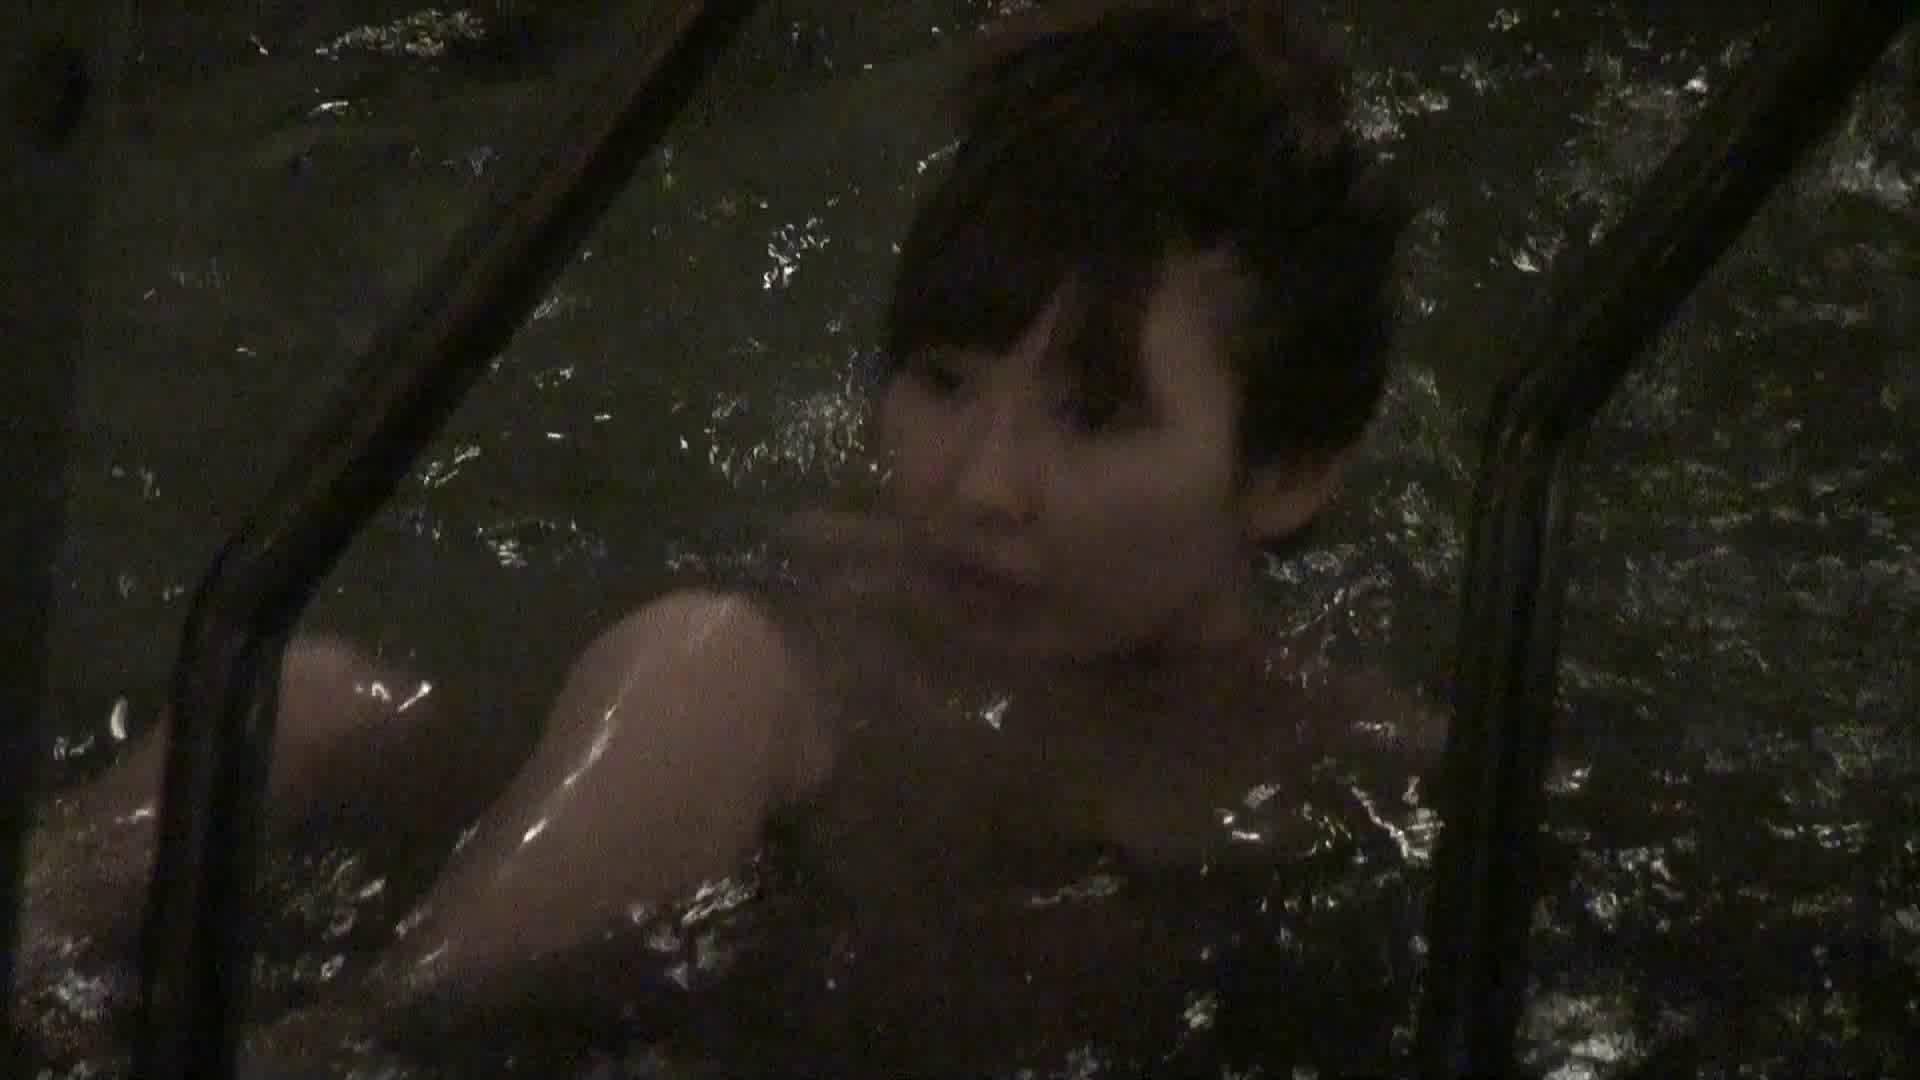 Aquaな露天風呂Vol.410 盗撮  73連発 20